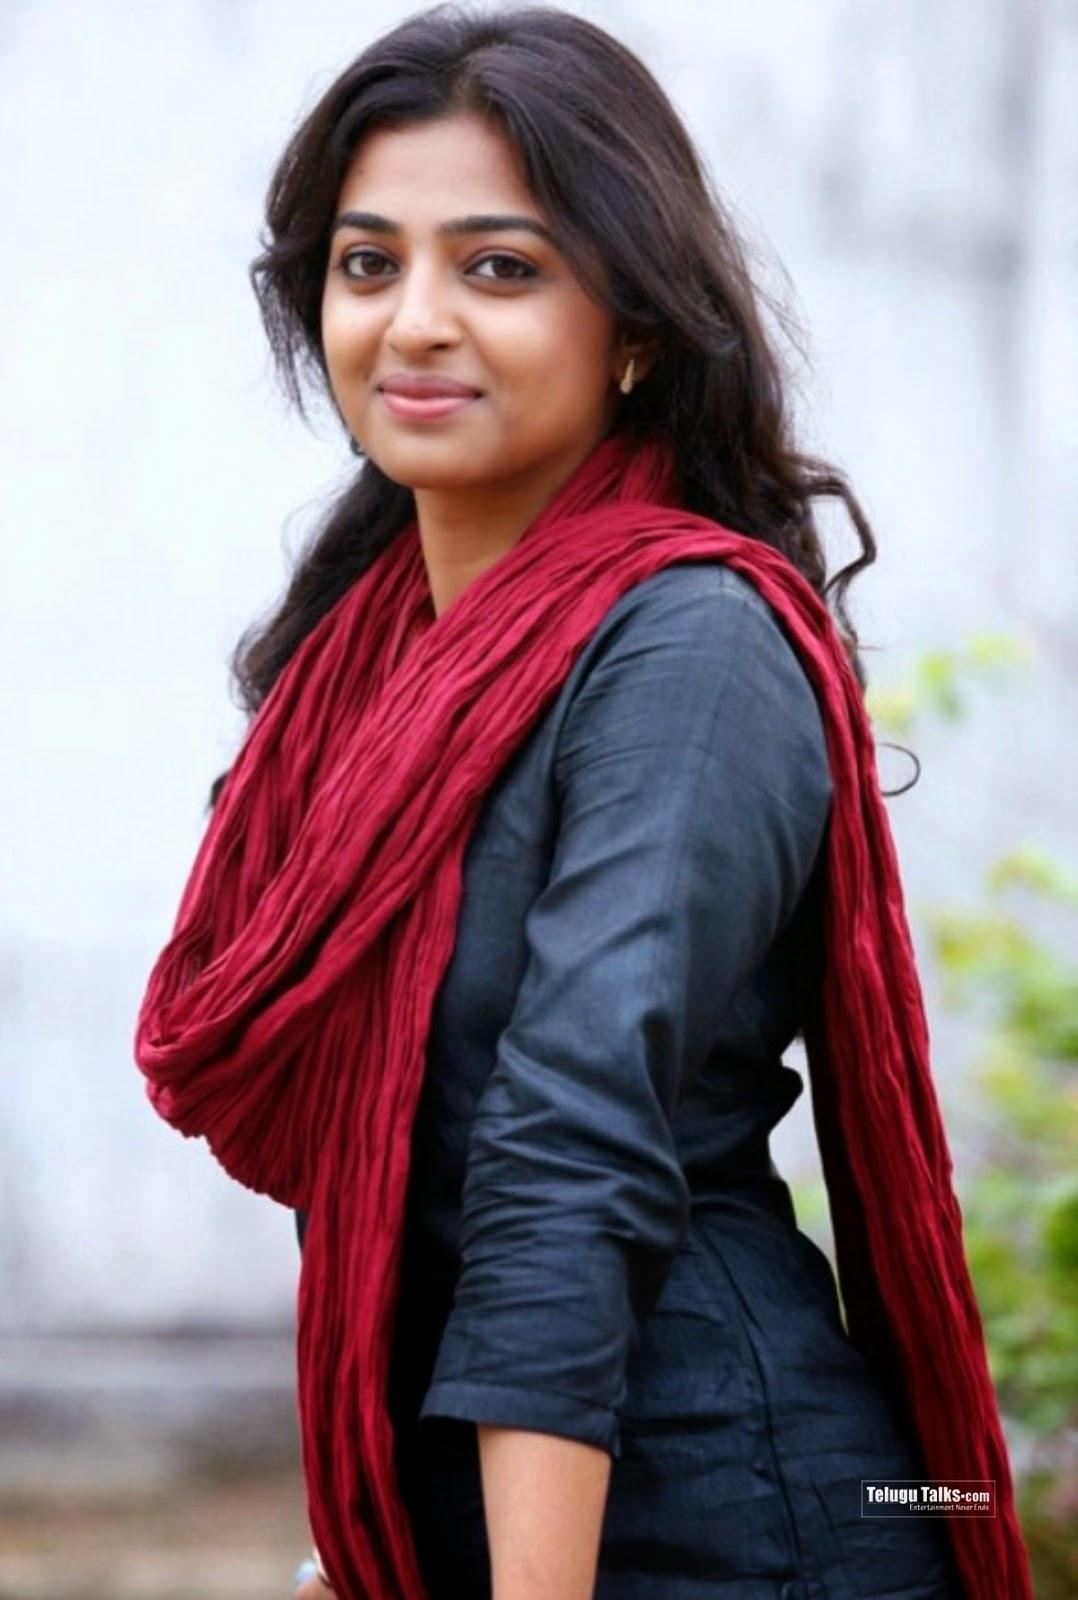 Radhika Apte Hot Pictures